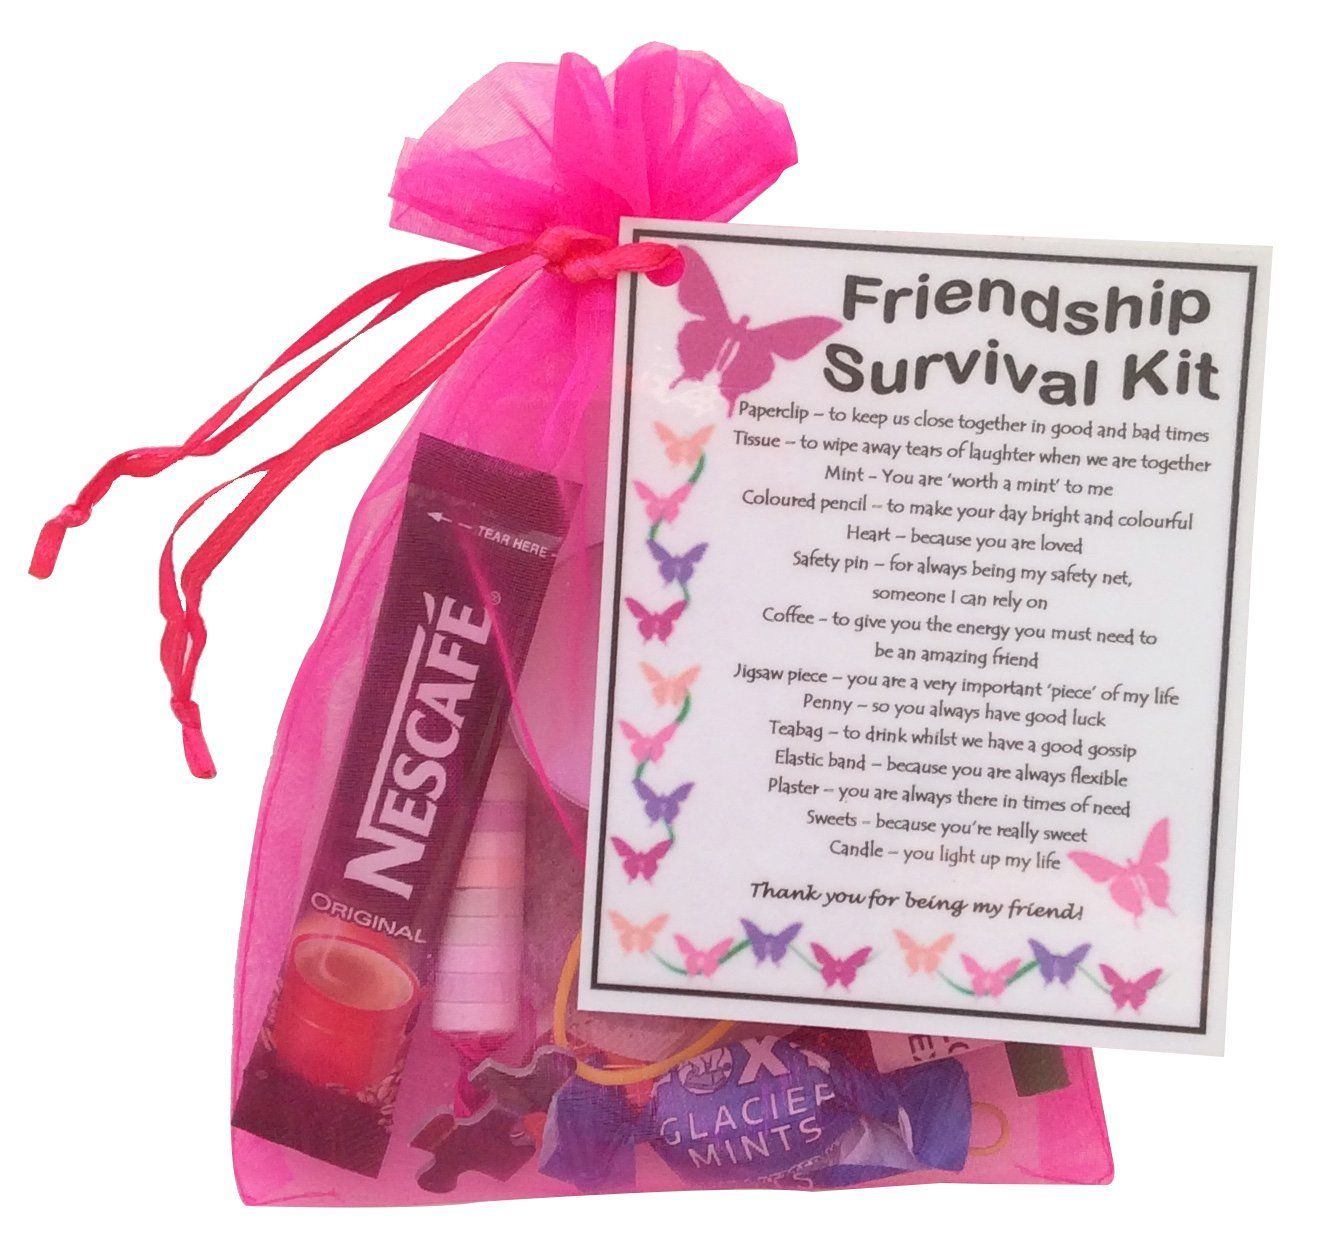 Friendship Survival Kit Gift (Great present for Birthday